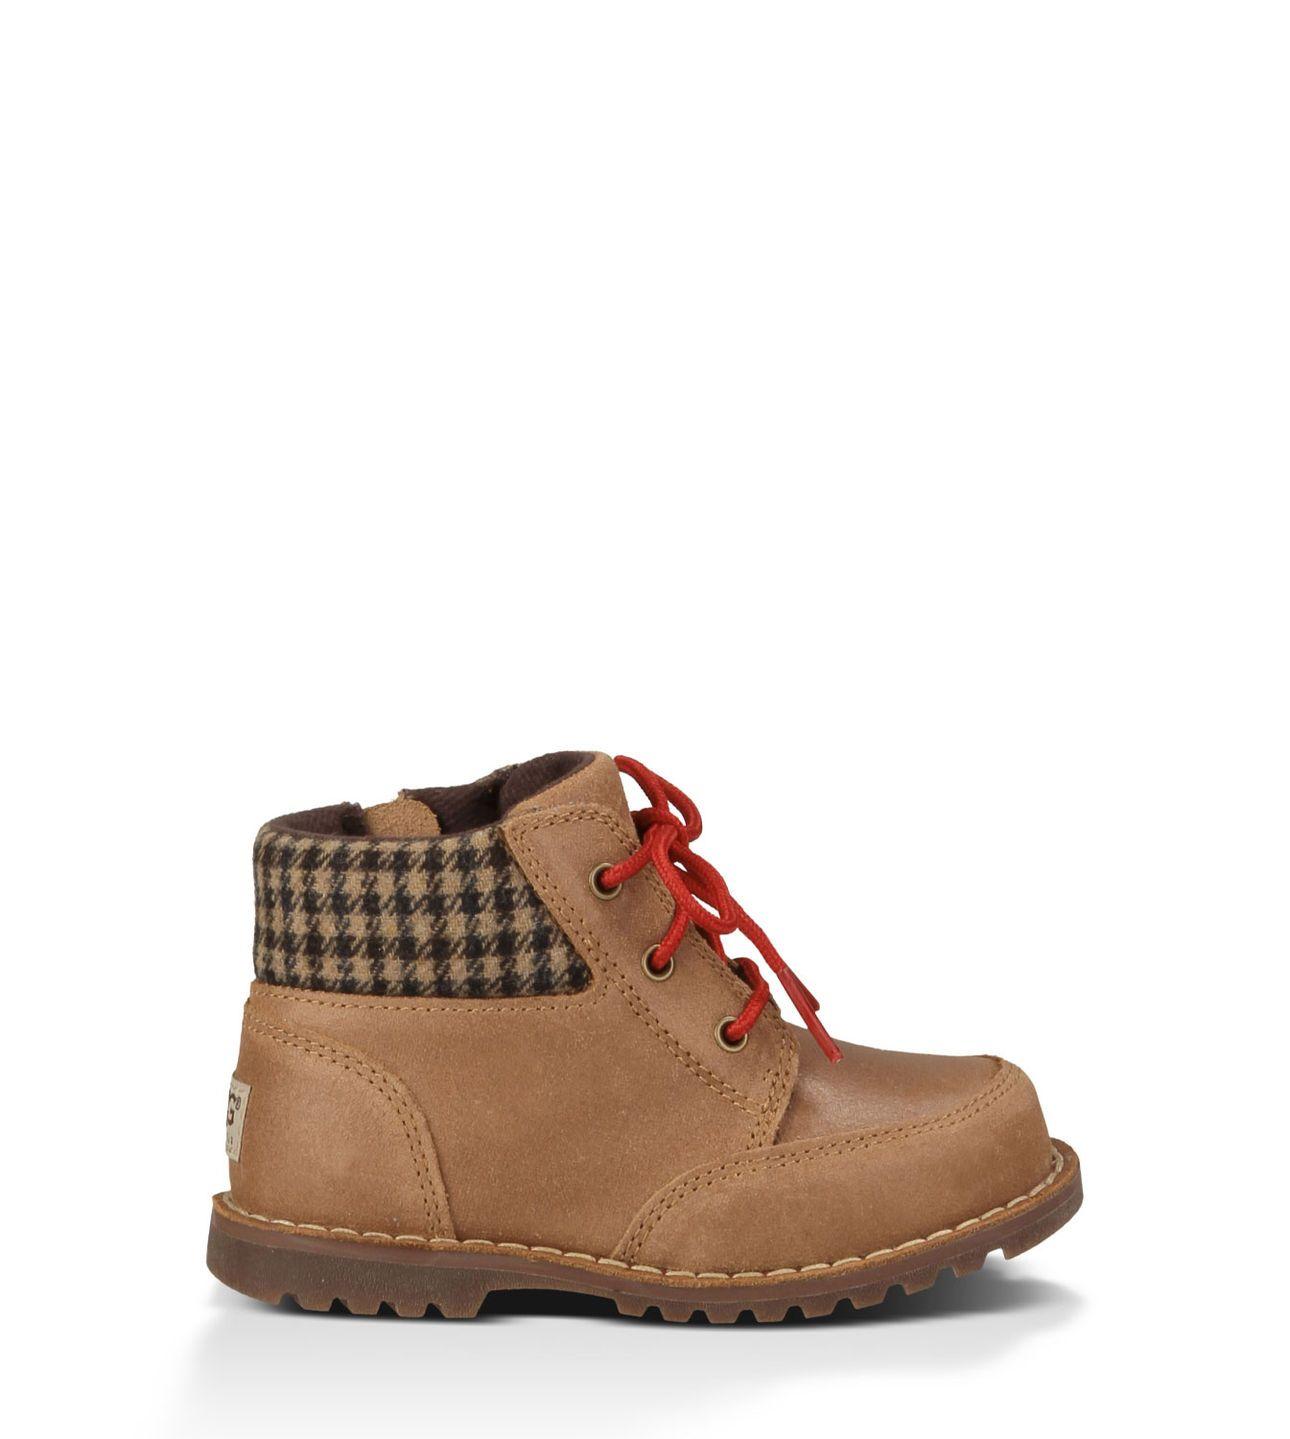 Kids shoes near me, Kids boots boys